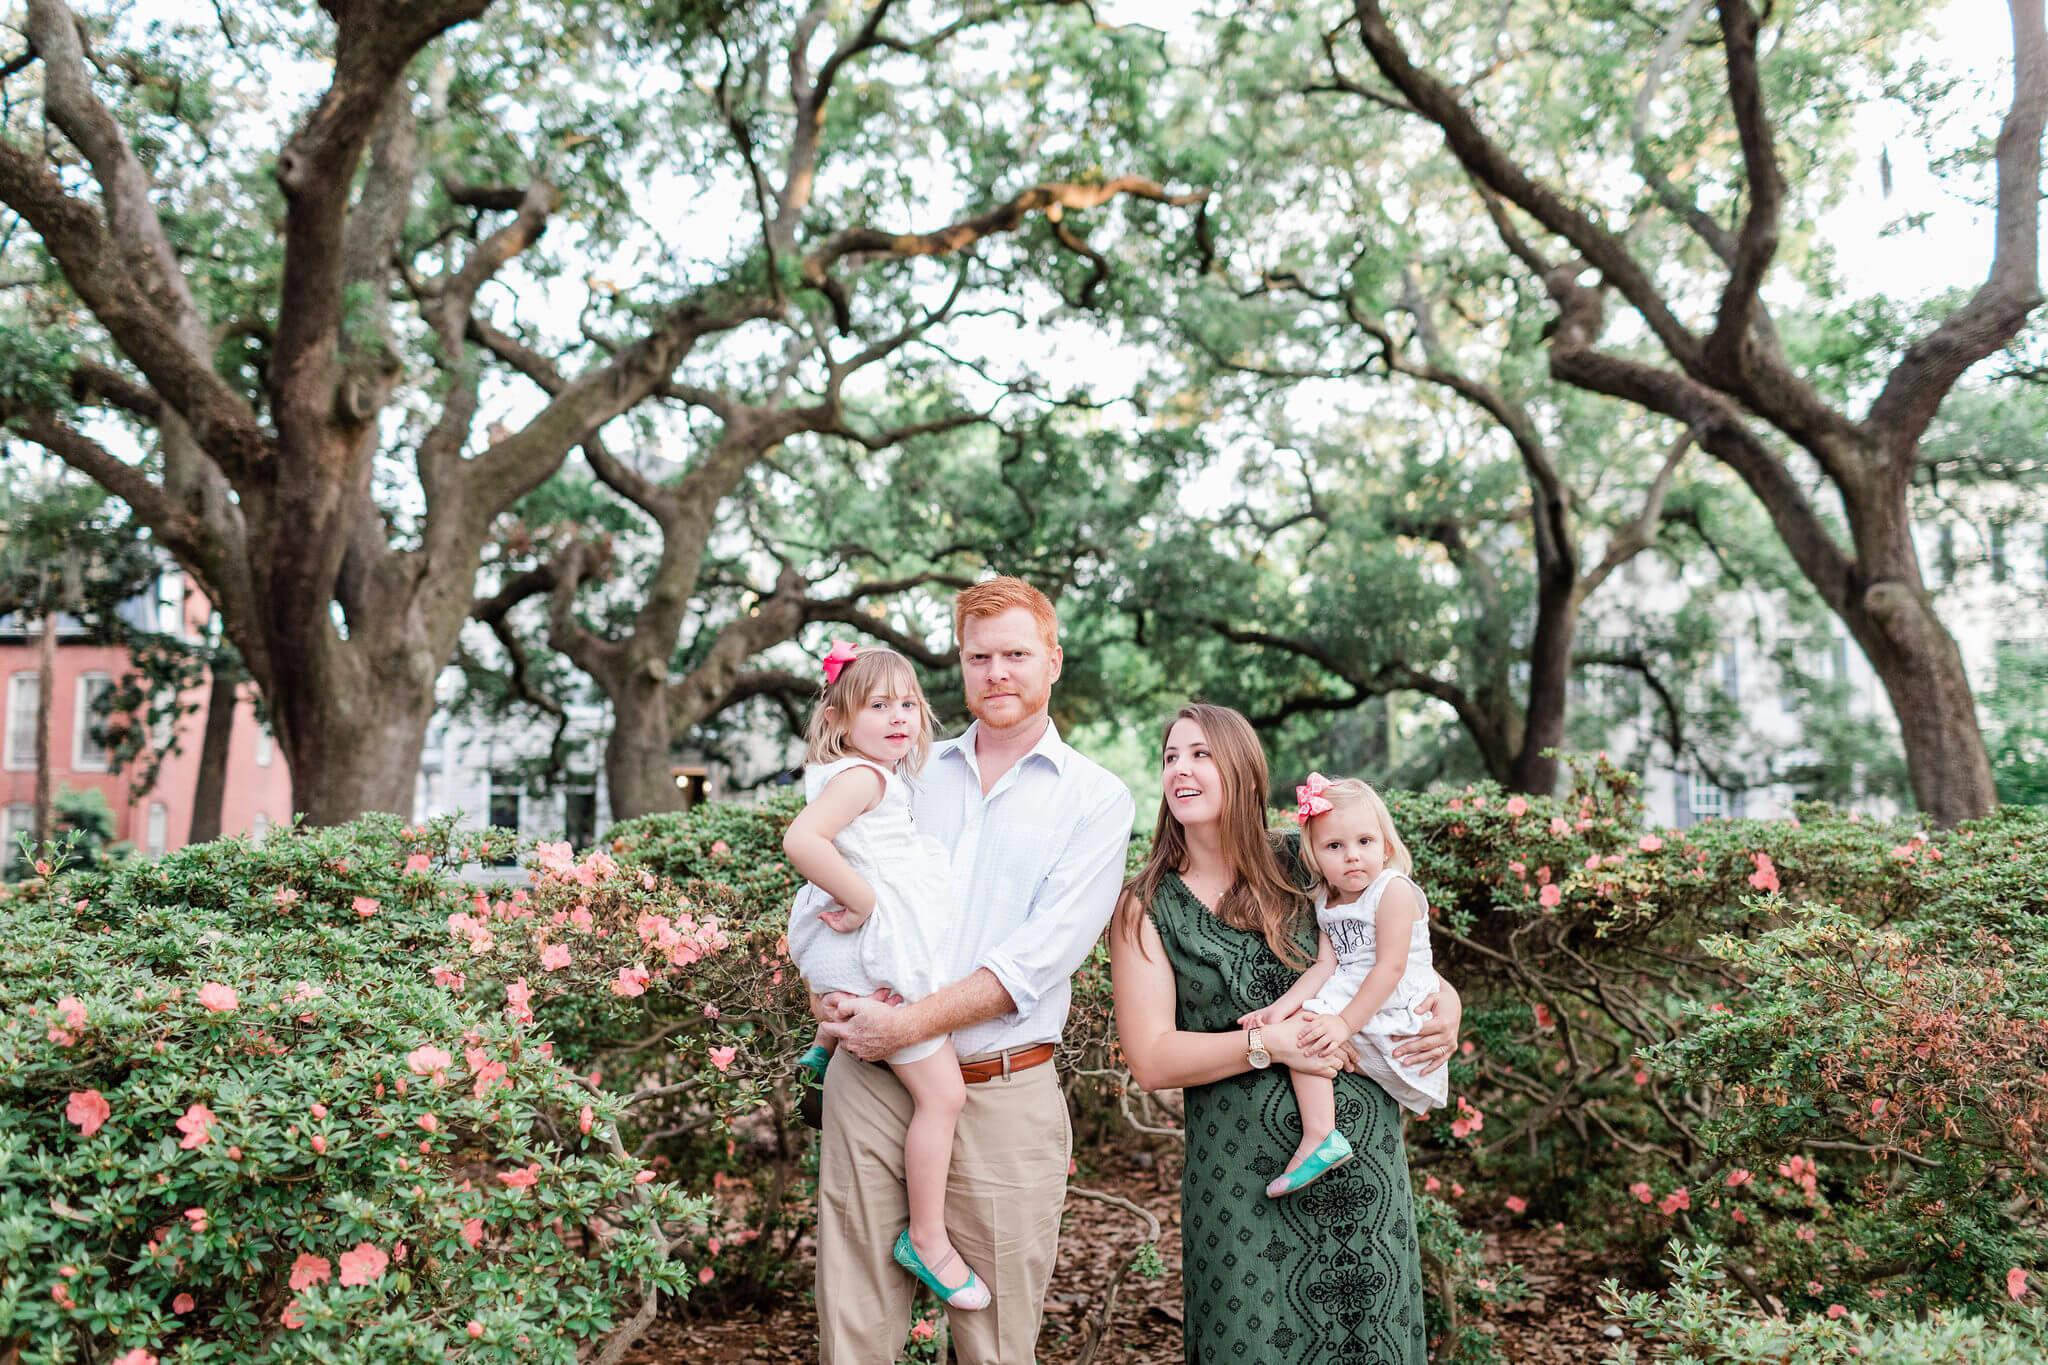 Apt-b-photography-savannah-engagement-photographer-savannah-family-kid-hilton-head-elopement-savannah-wedding-photographer-13.jpg